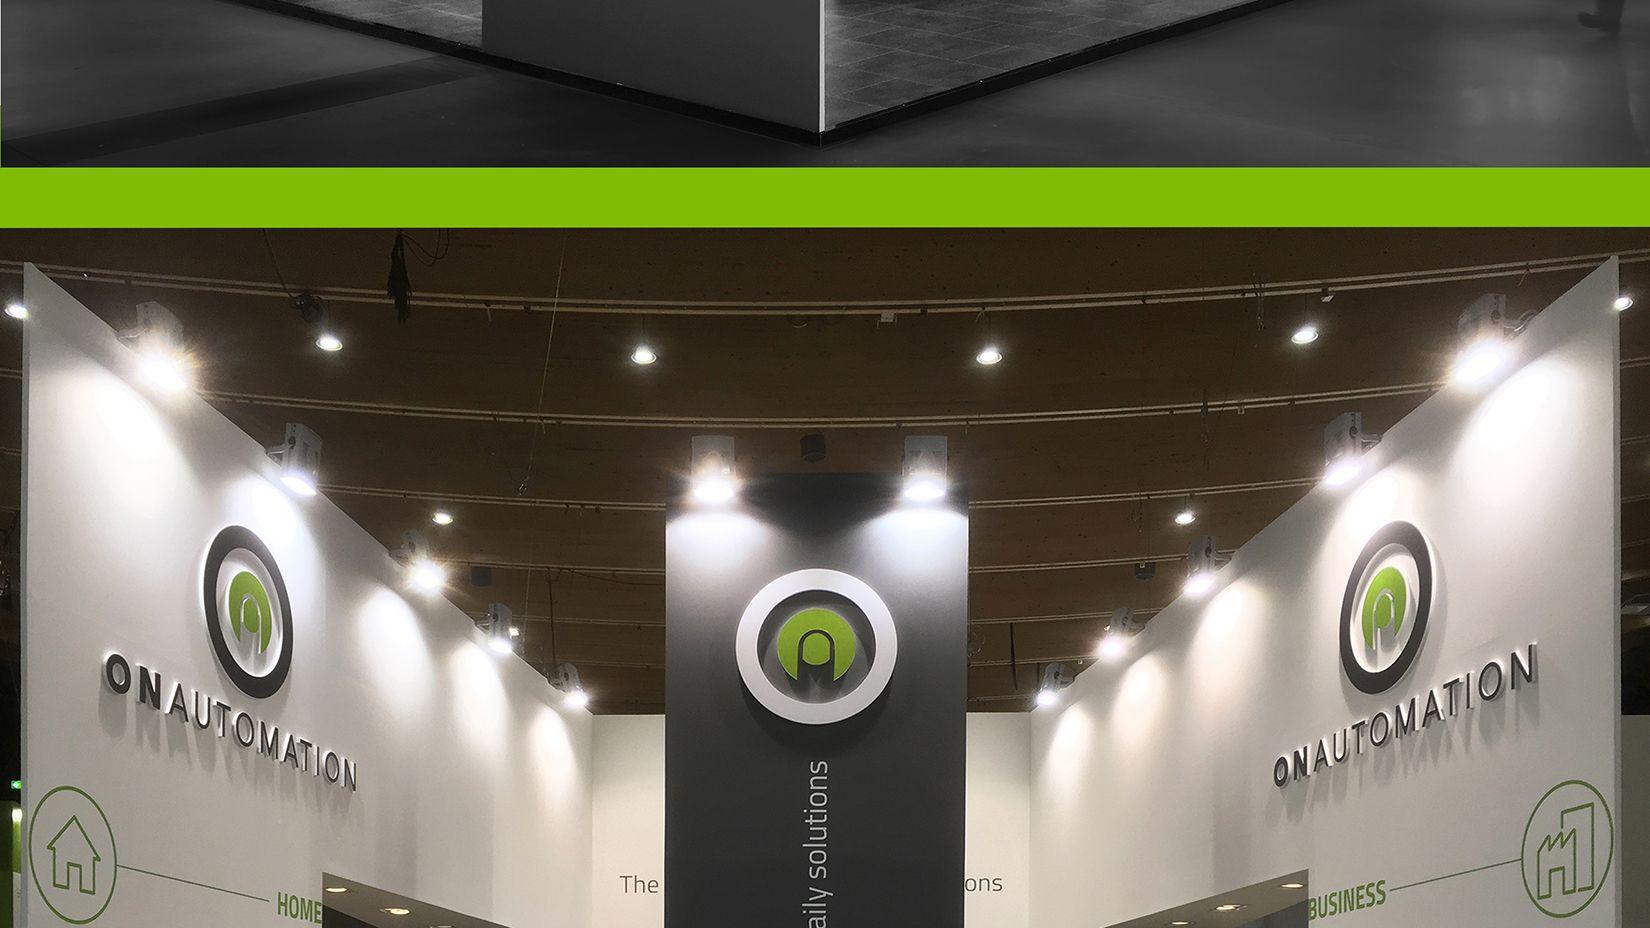 Allestimenti Fieristici Design Stand R+T 2018 OnAutomation 08